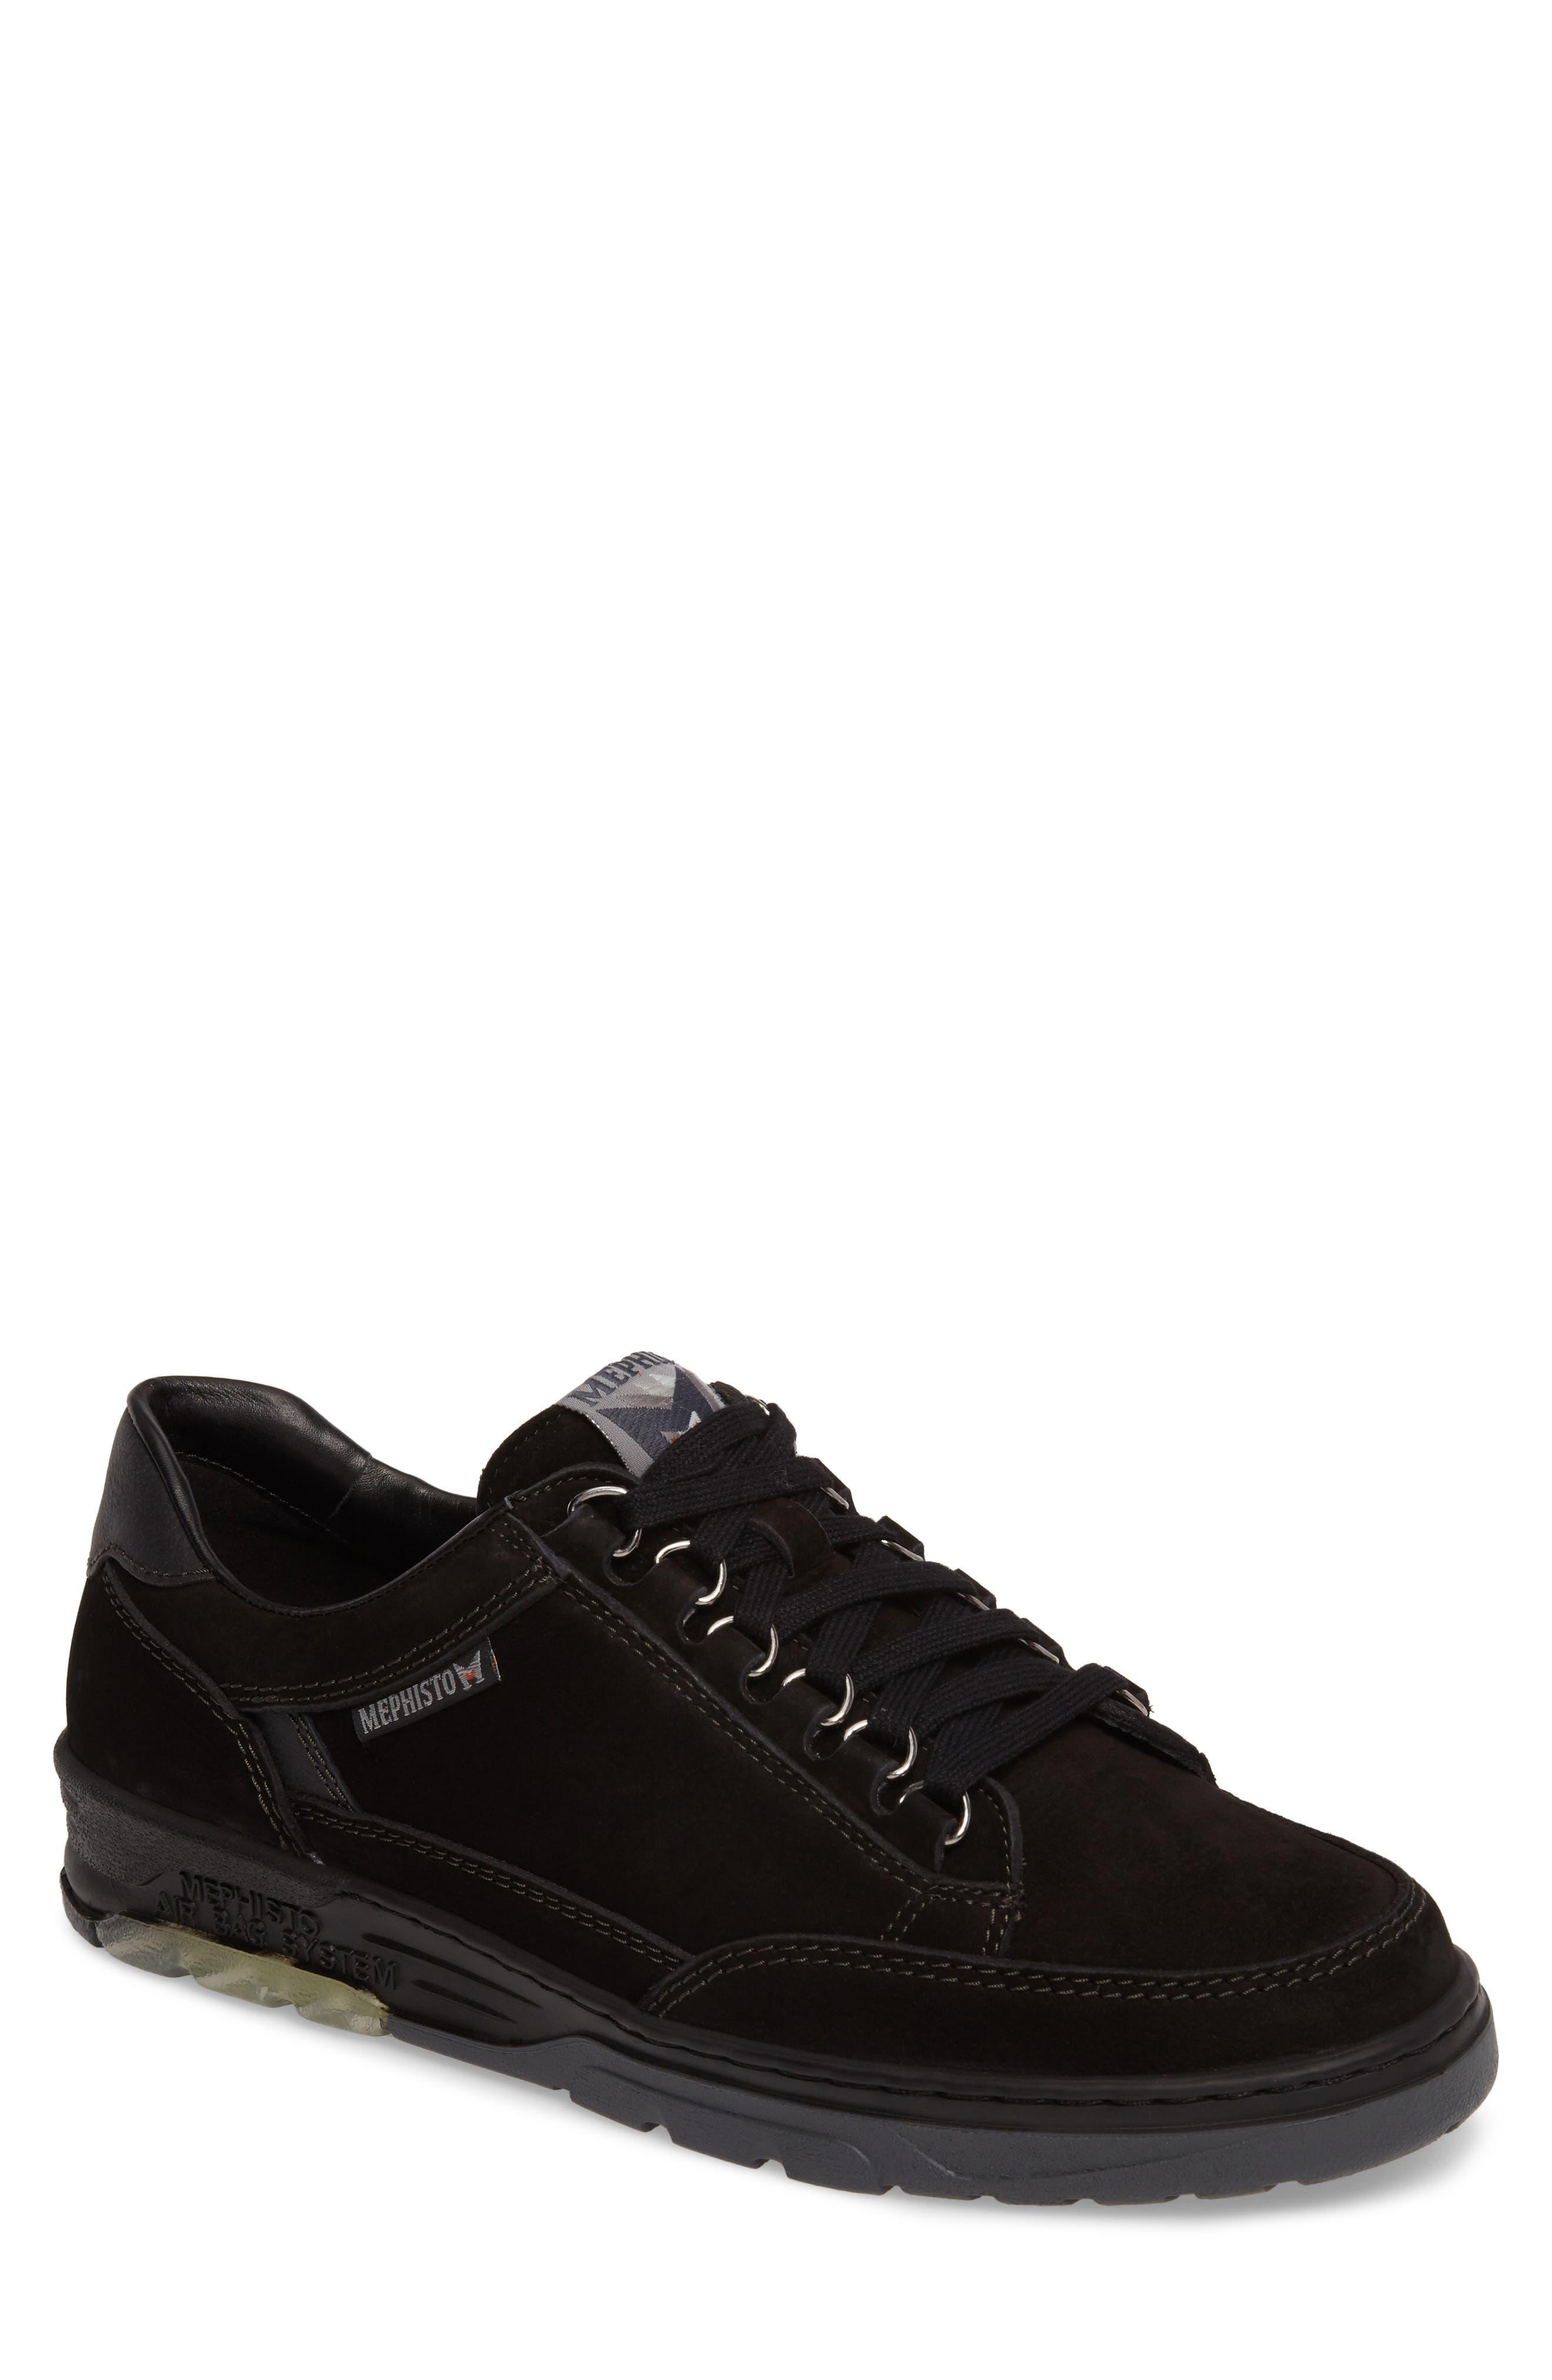 Mick Sneaker,                             Main thumbnail 1, color,                             BLACK SPORTBUCK